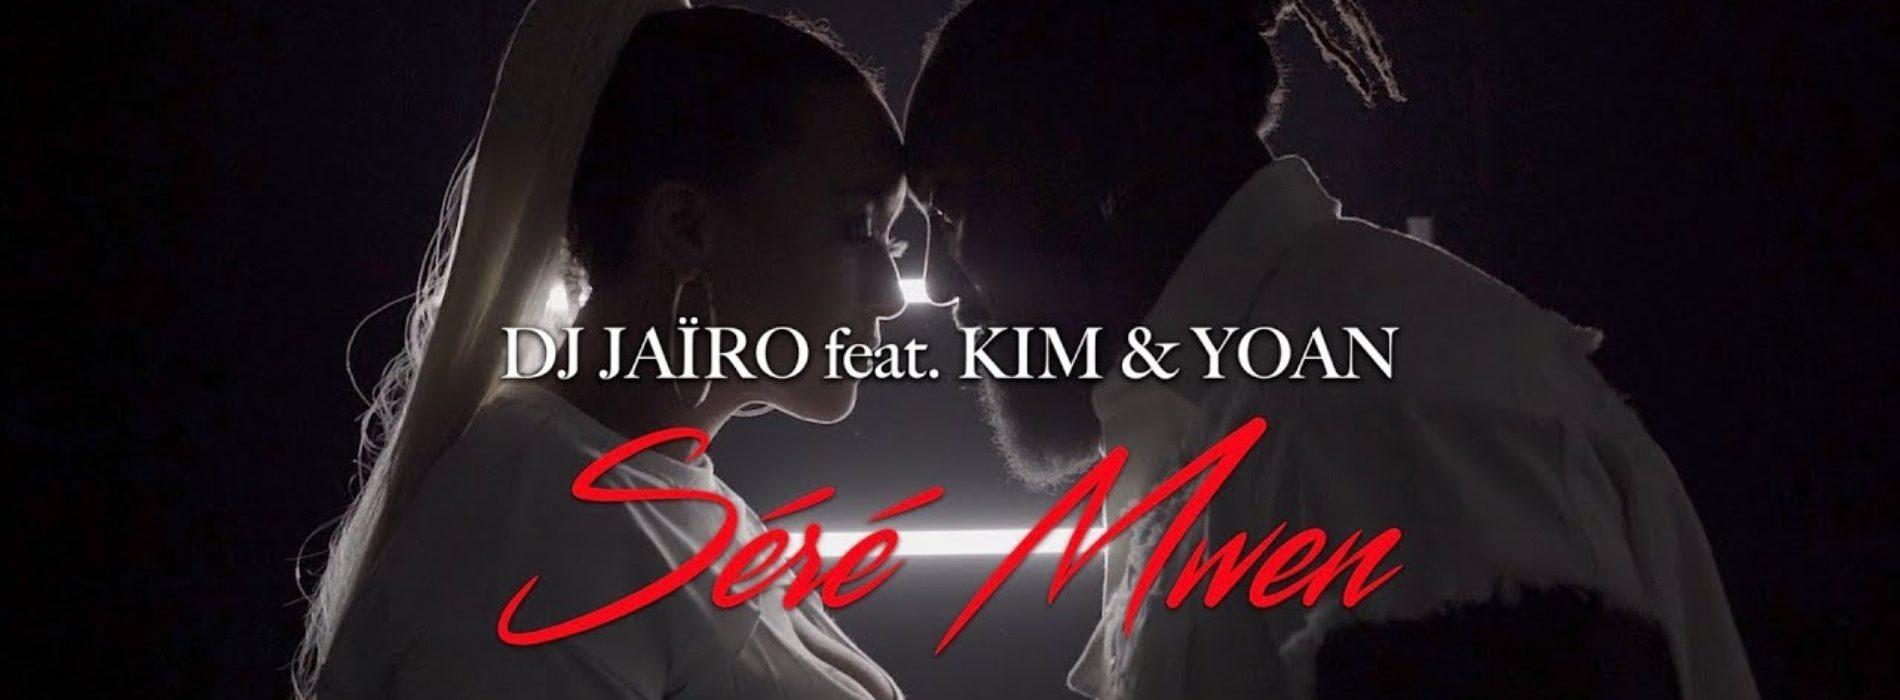 Dj Jaïro feat. Kim & Yoan – Séré Mwen – Septembre 2019